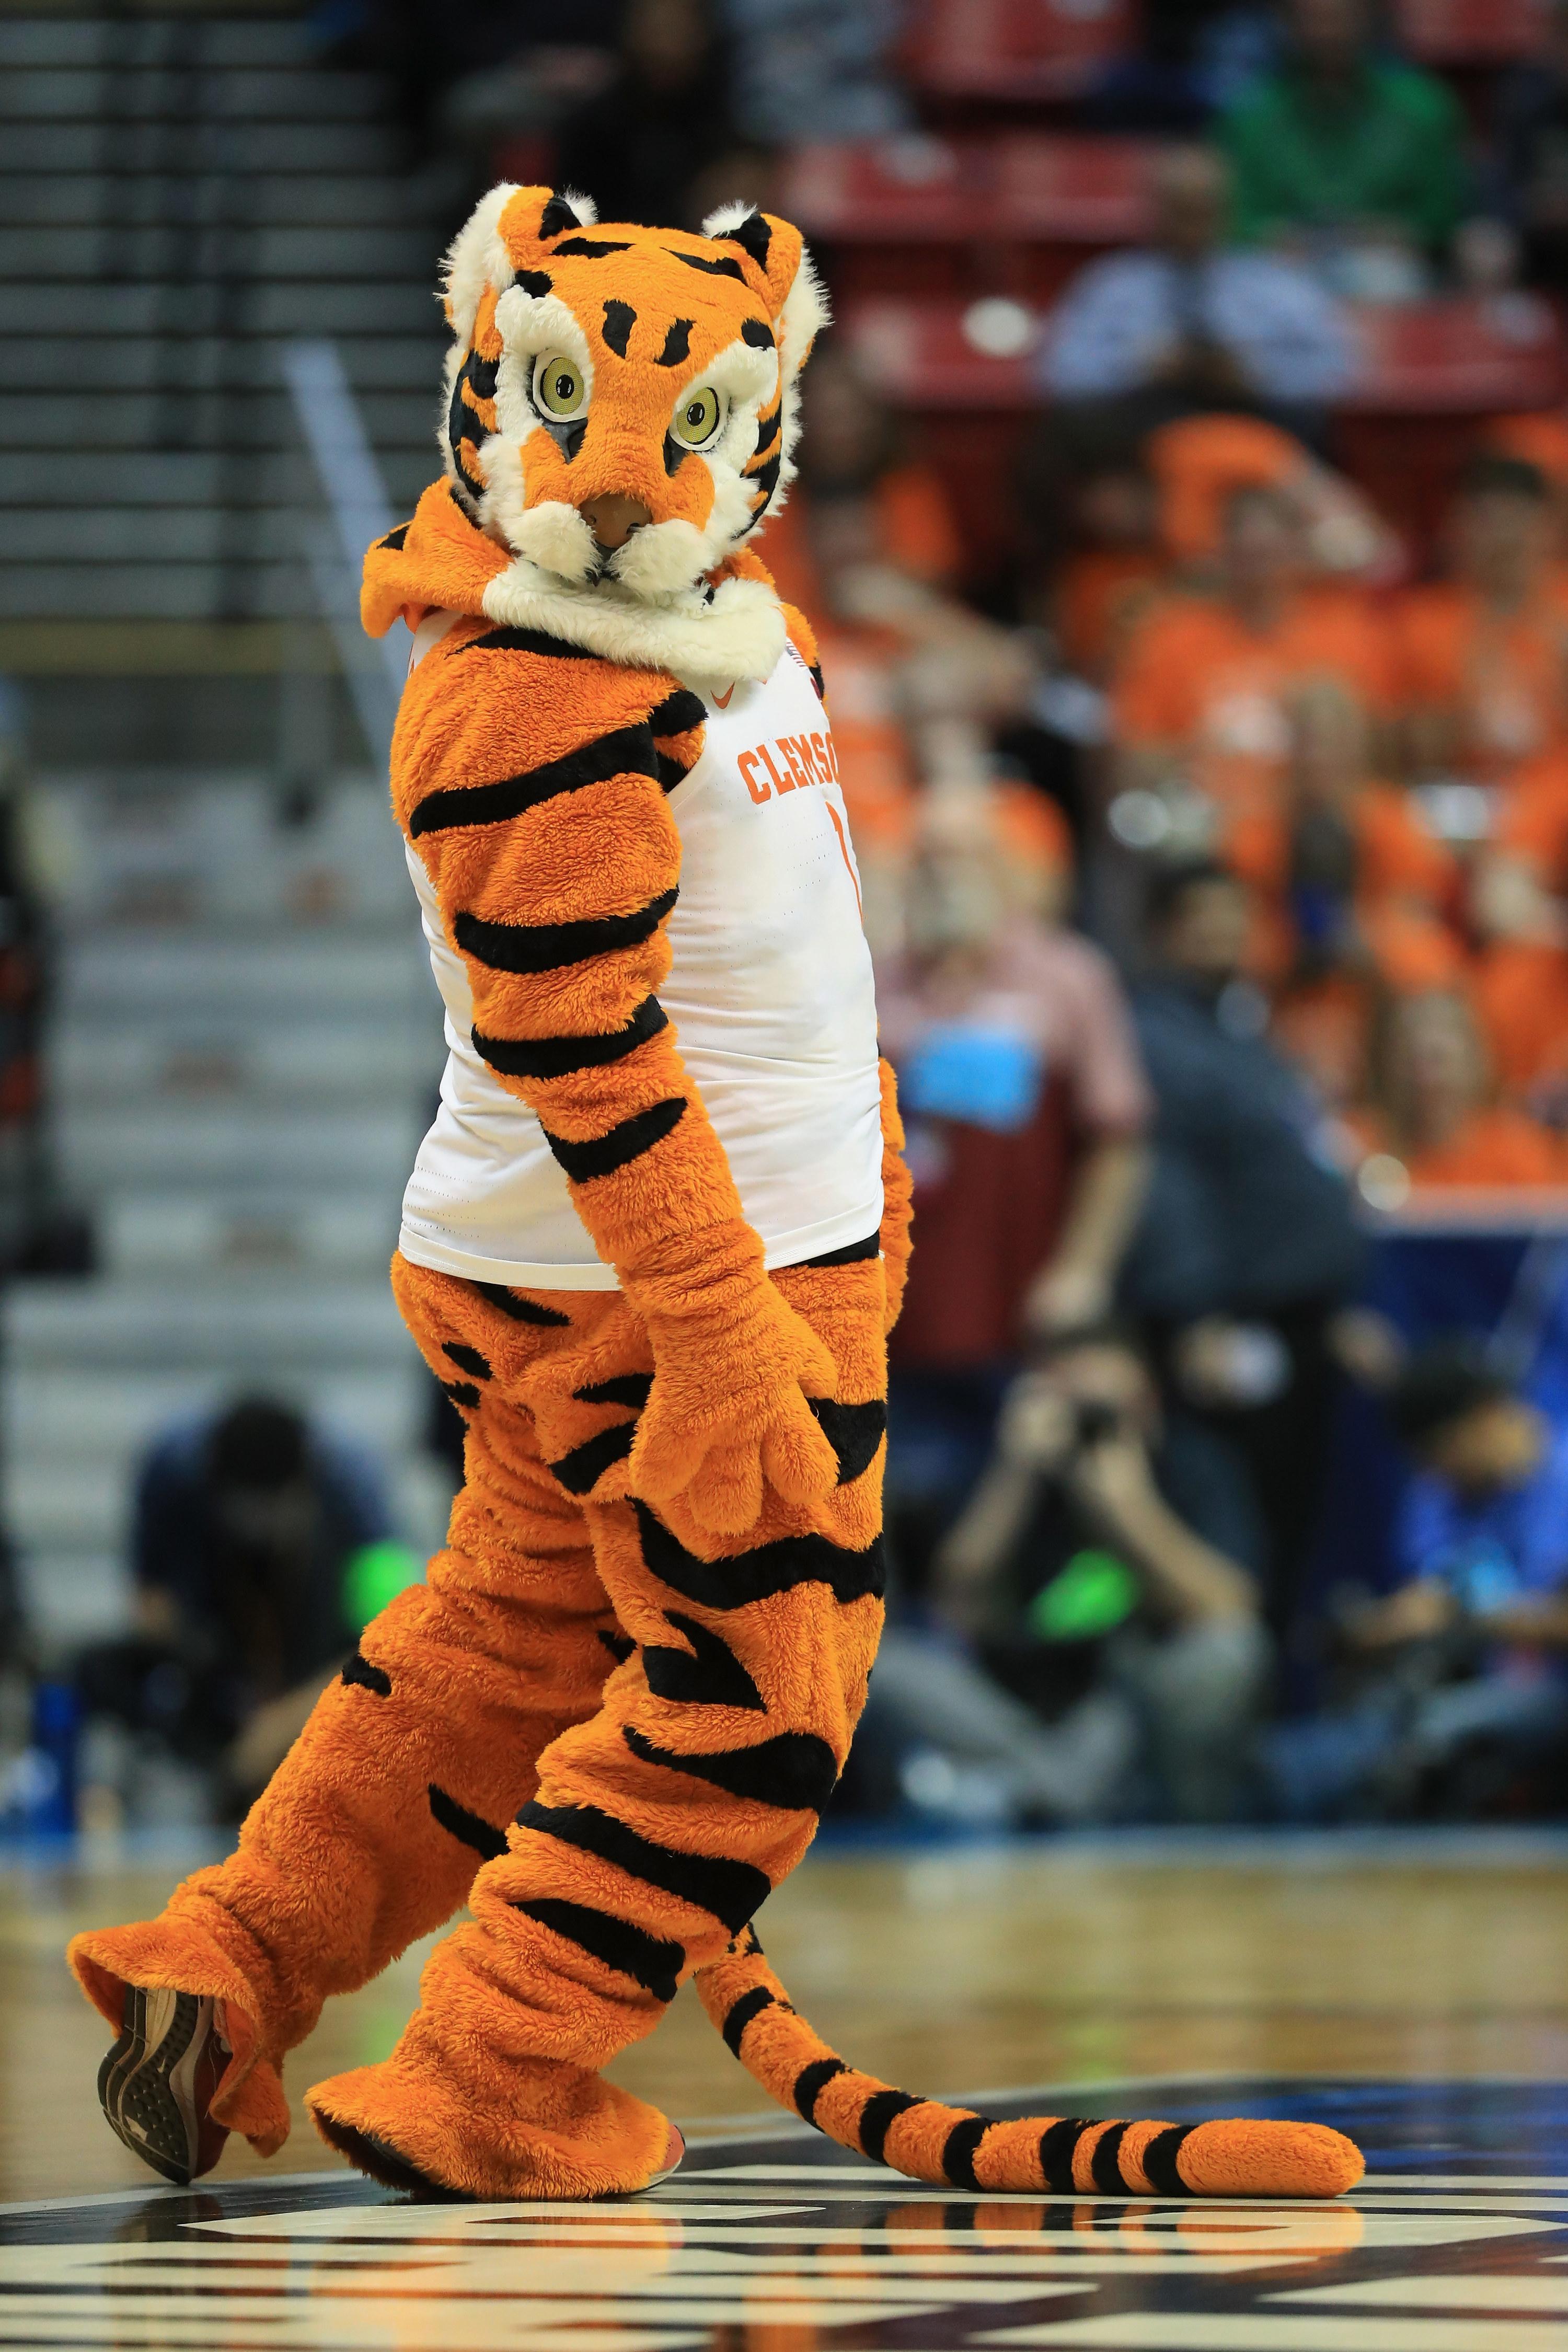 Orange and black Clemson Tiger mascot wearing a white jersey.